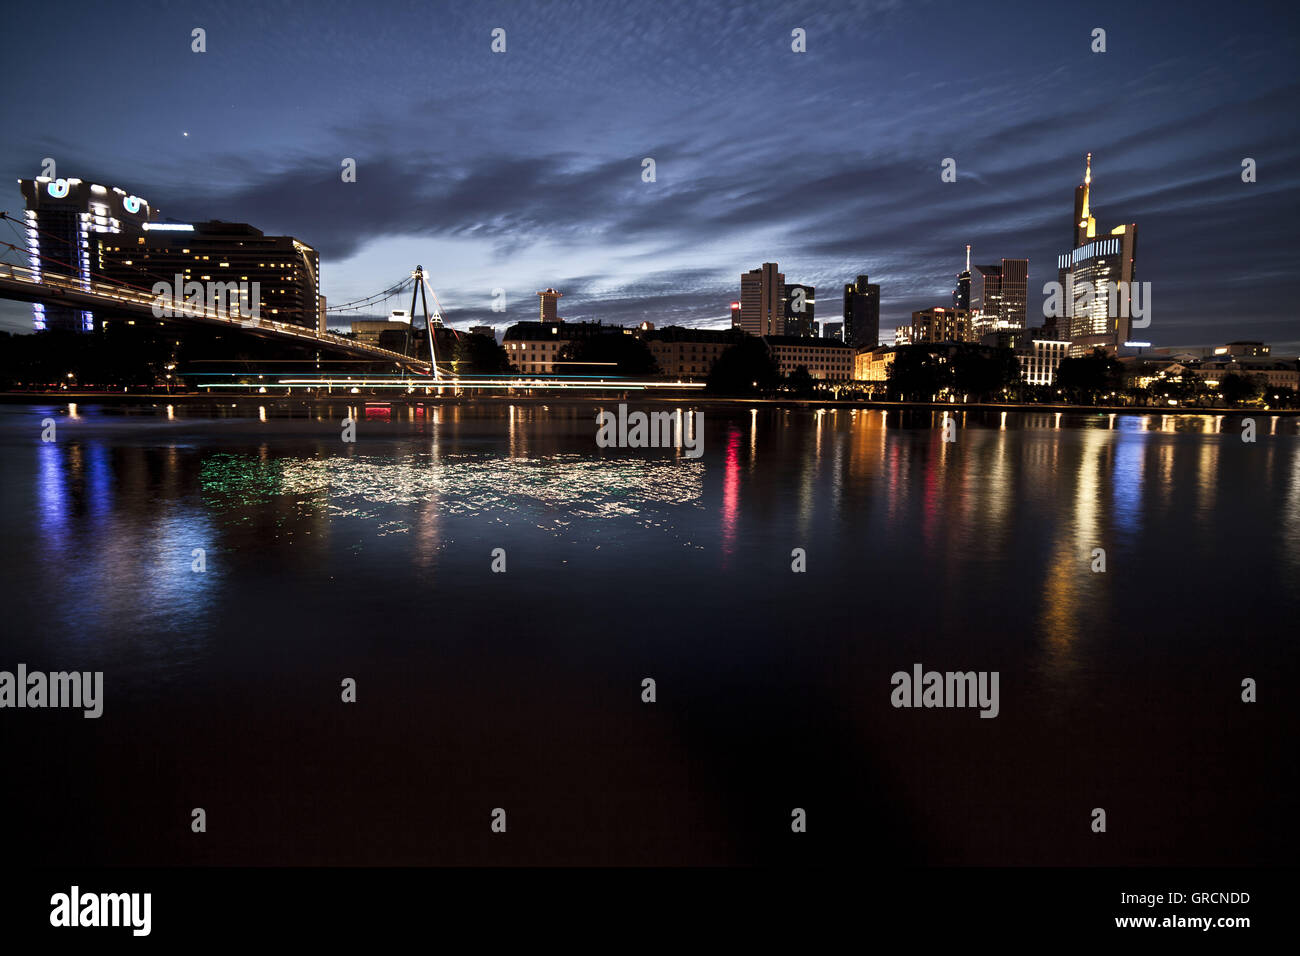 Skyline Frankfurt With Holbeinsteg At Night,Longtime Exposure - Stock Image